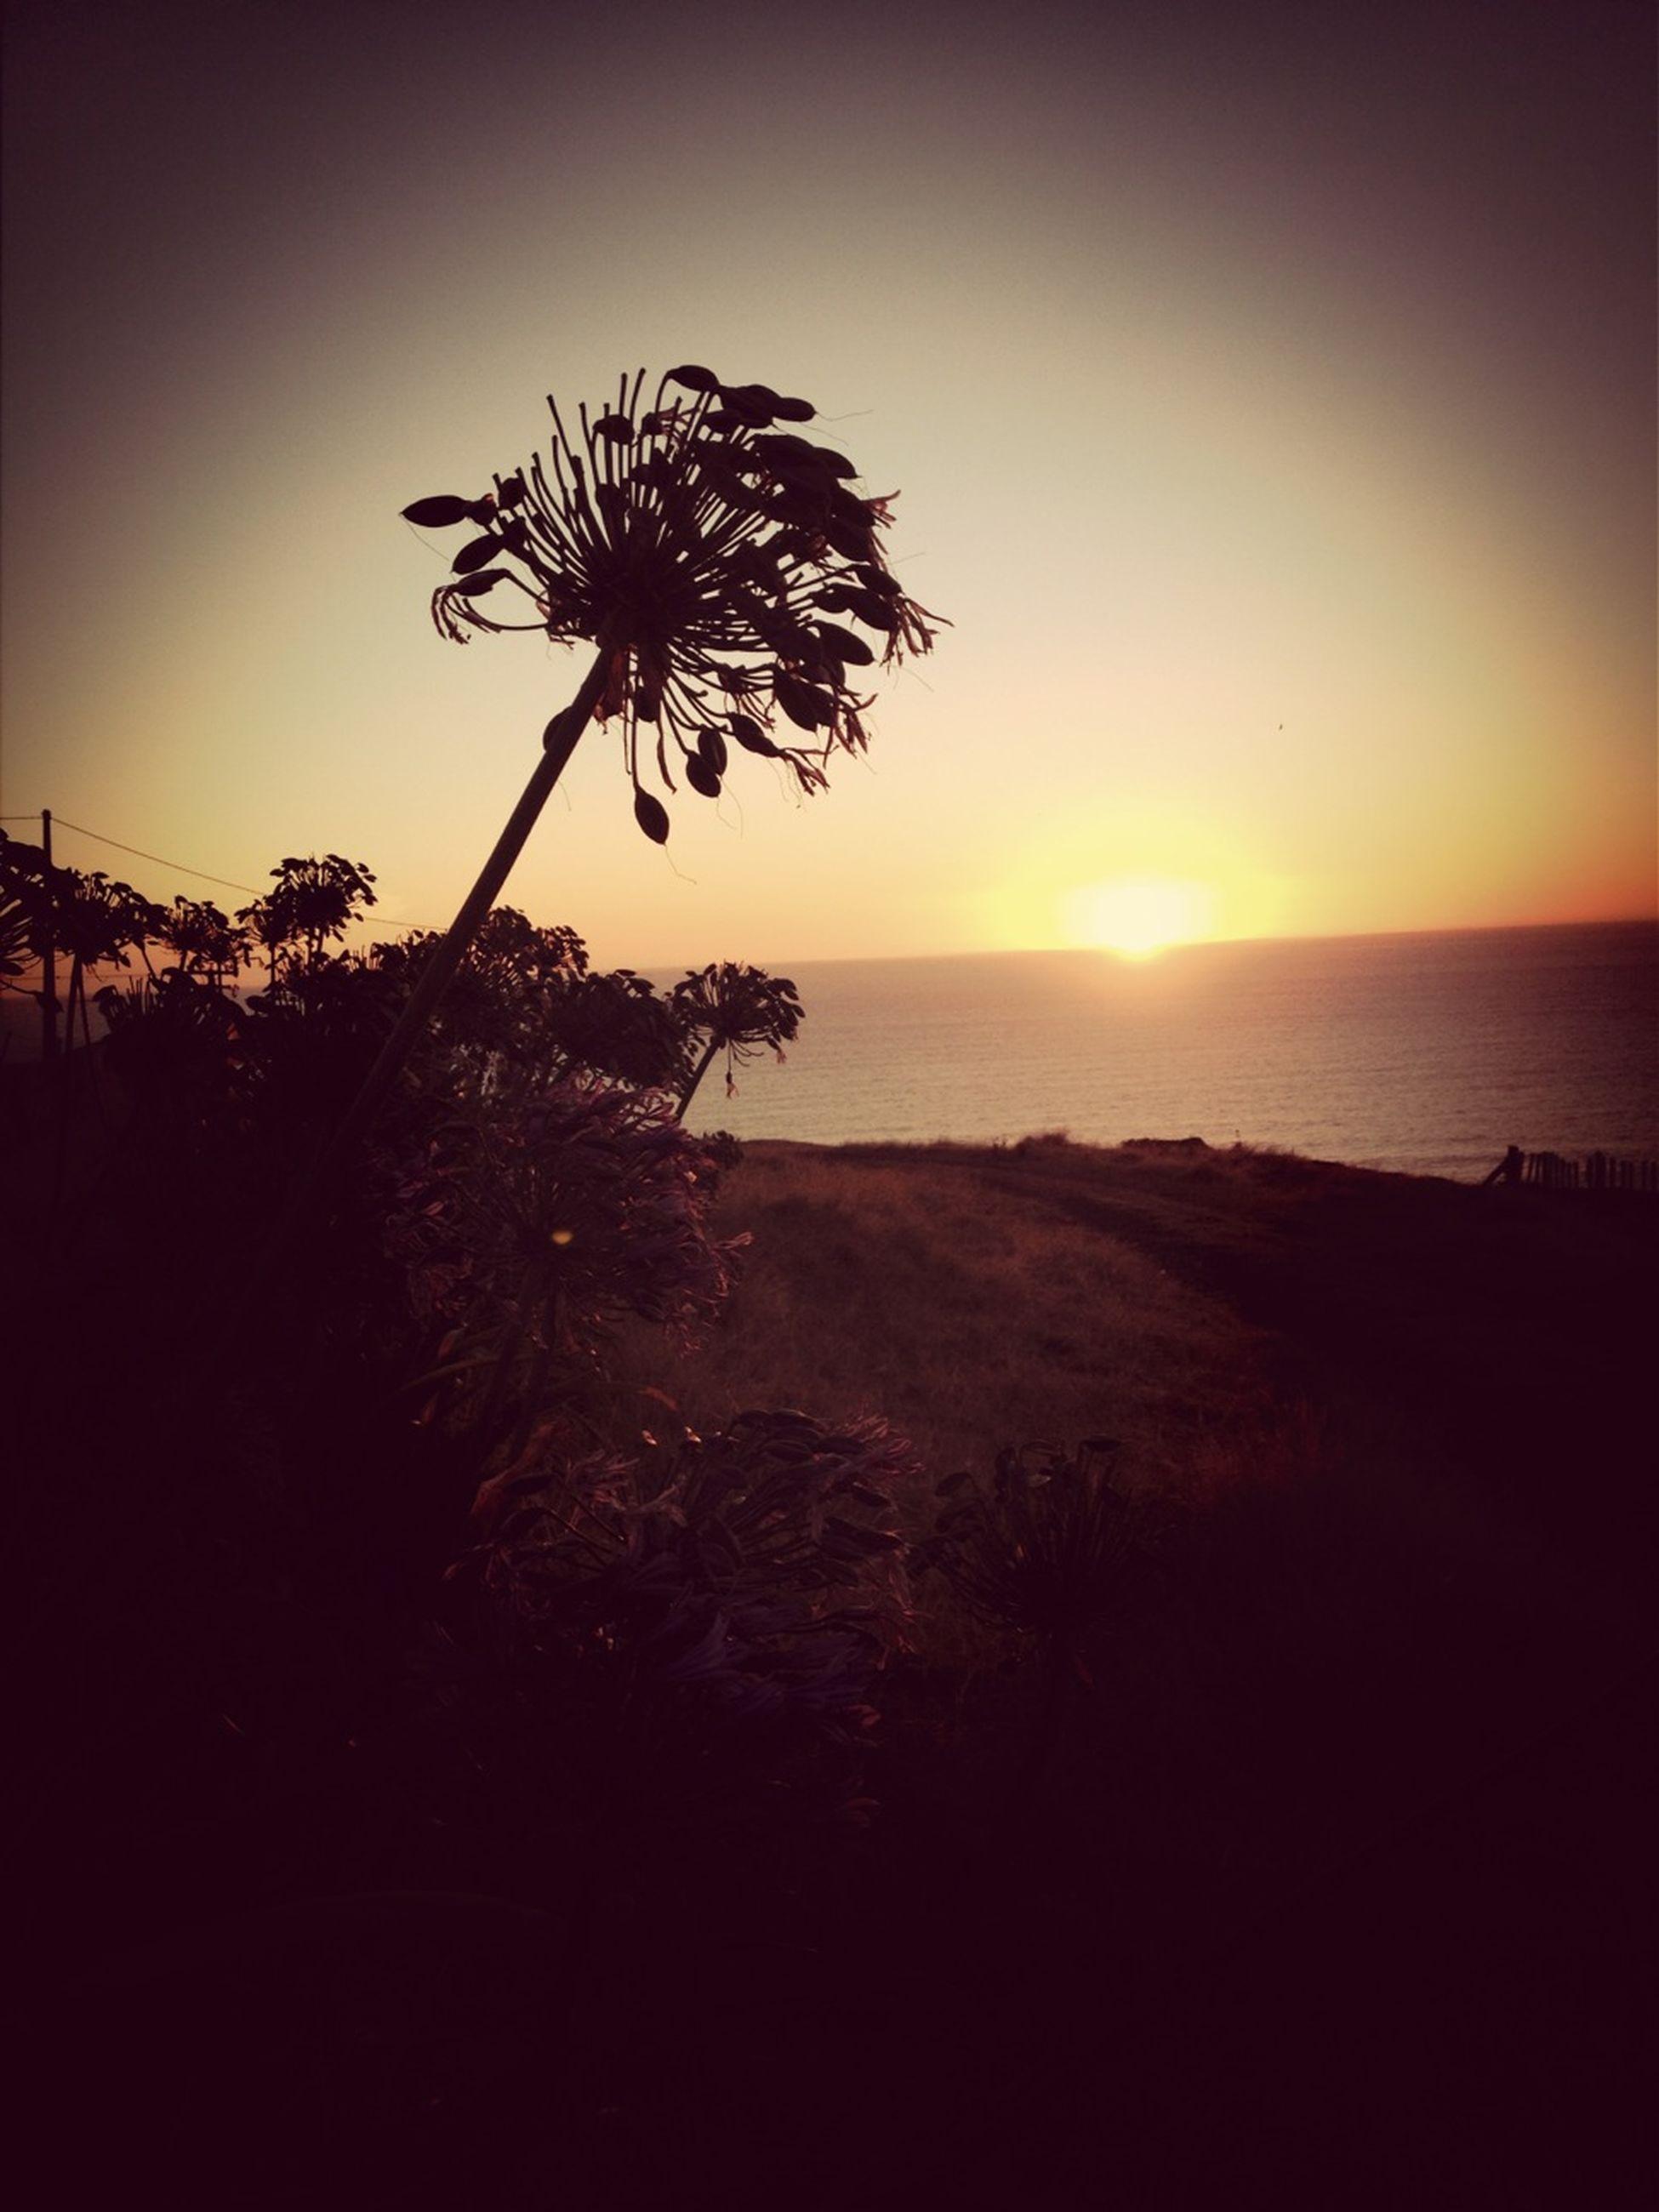 horizon over water, sea, sunset, tranquil scene, beach, scenics, tranquility, water, beauty in nature, shore, sky, nature, silhouette, sun, idyllic, clear sky, orange color, tree, coastline, palm tree